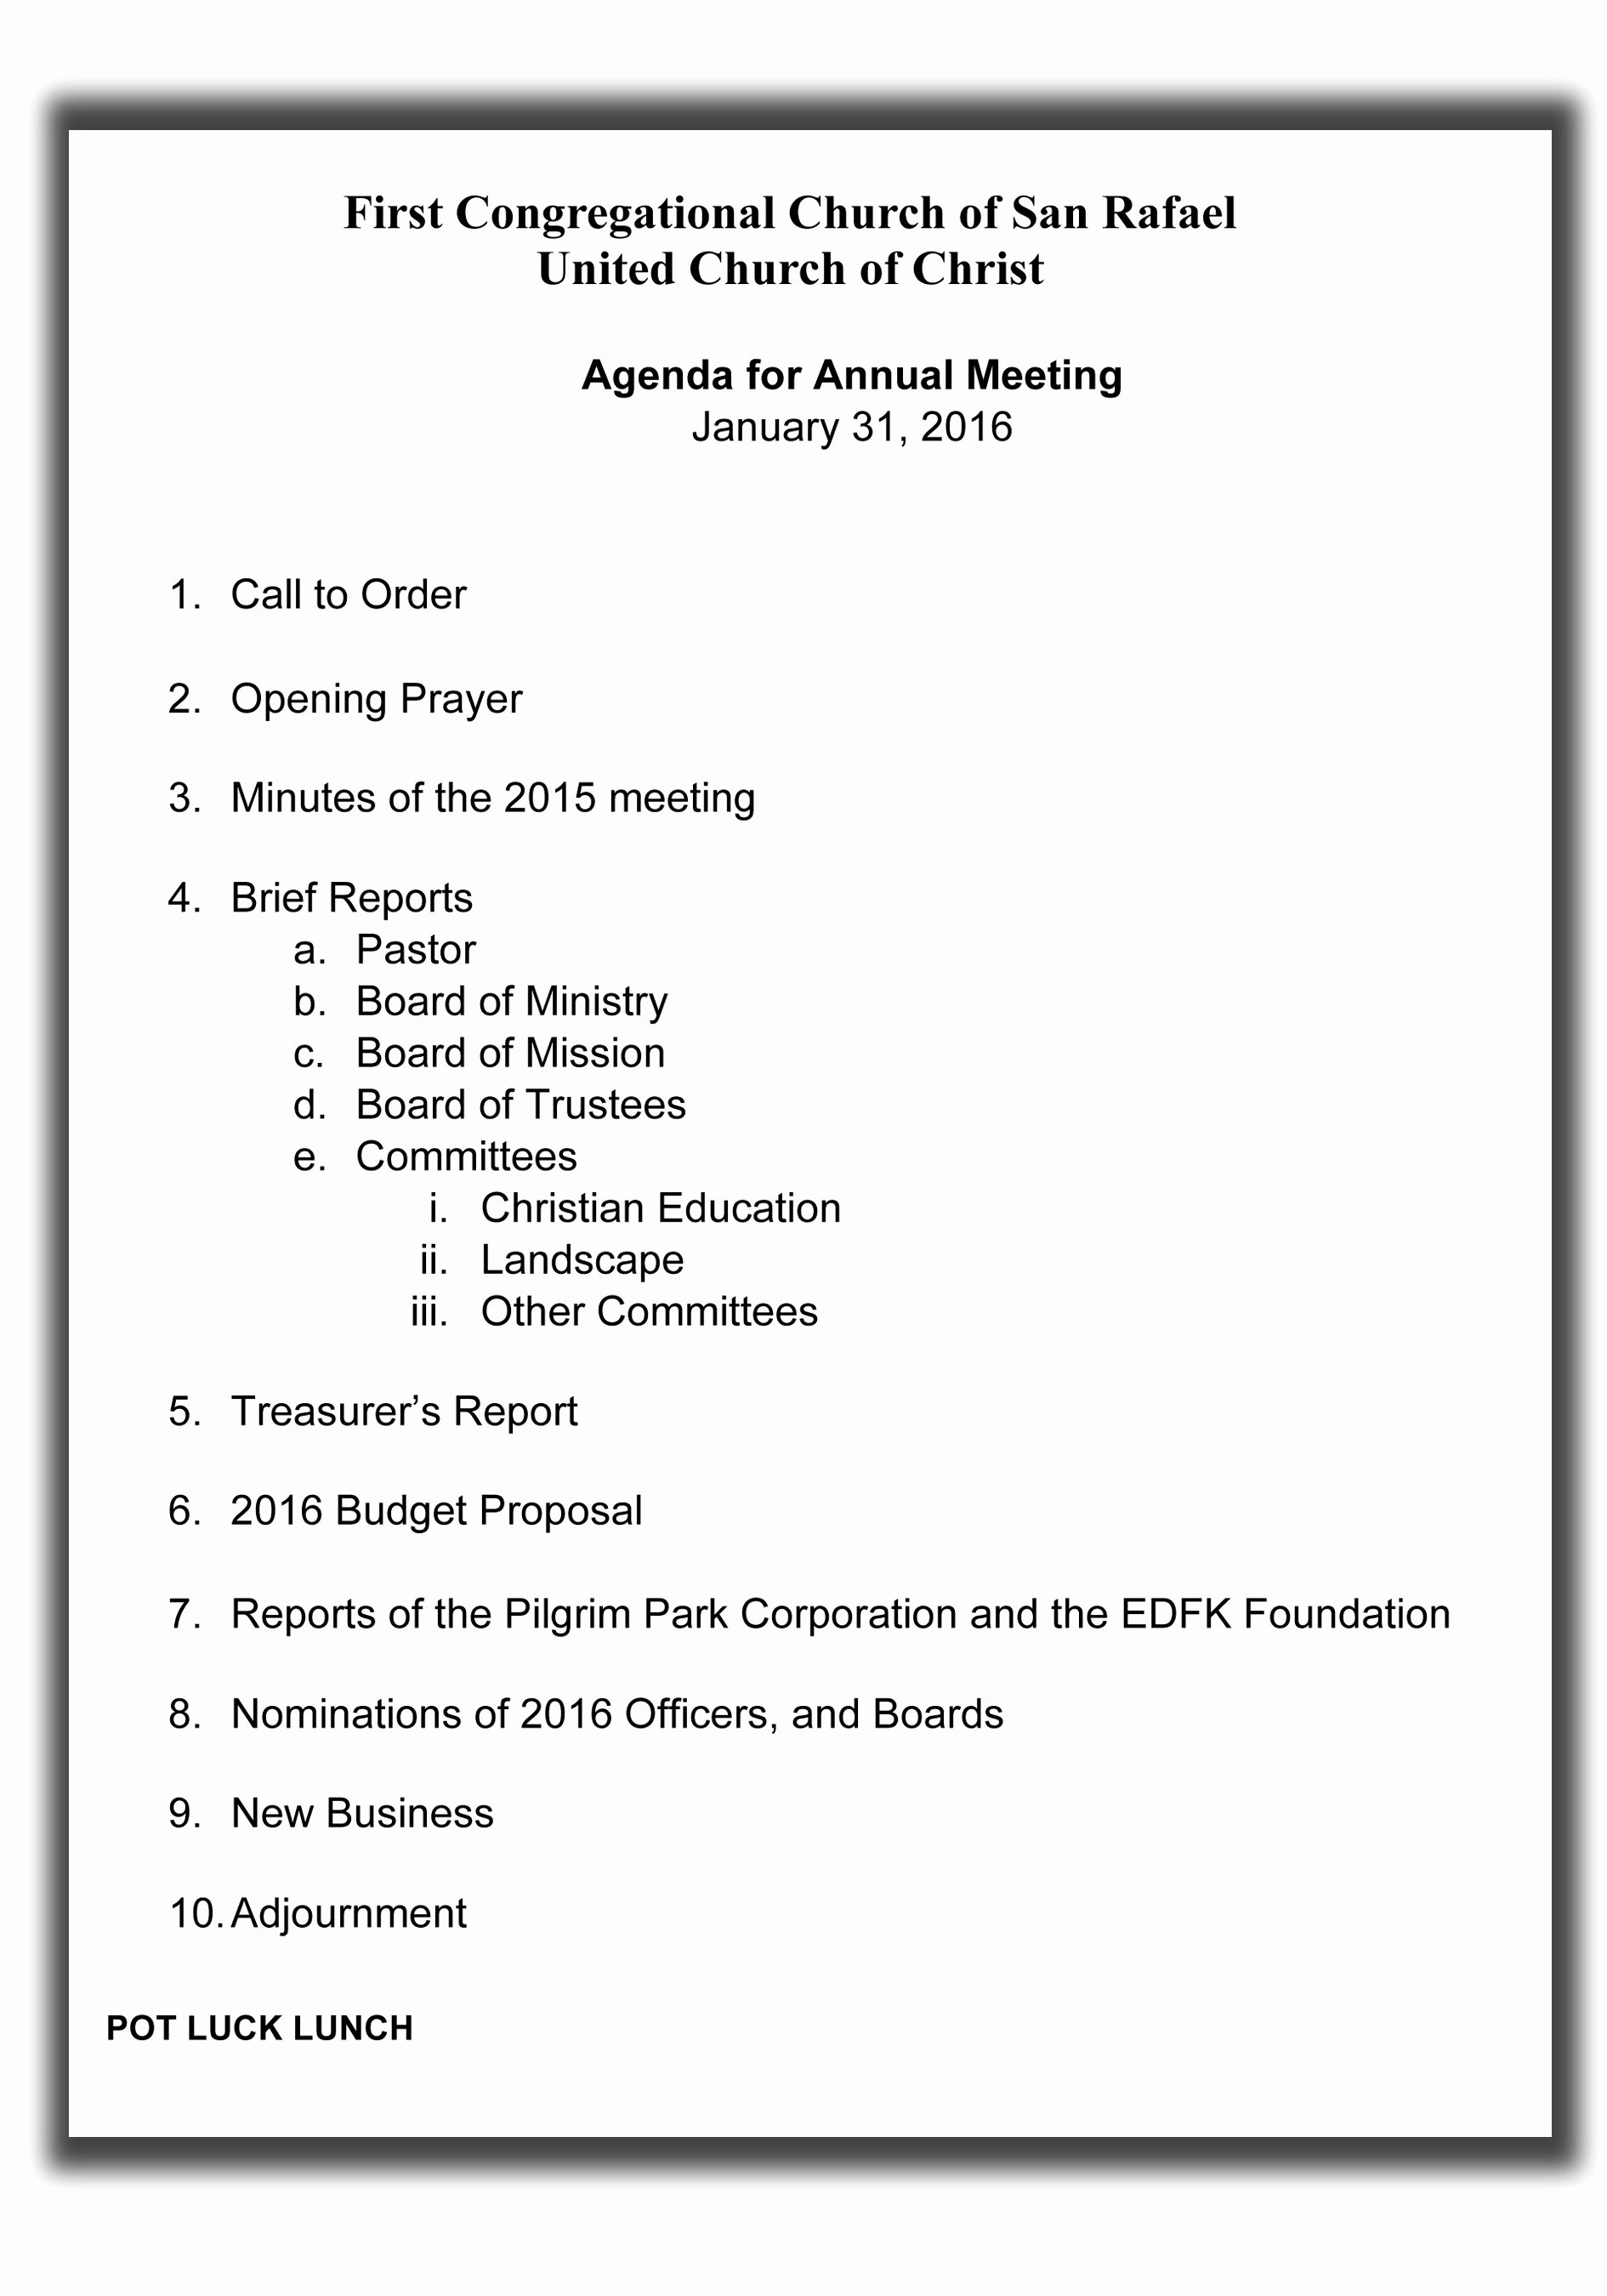 Church Meeting Minutes Template Luxury Annual Meeting Agenda – First Congregational Church Of San